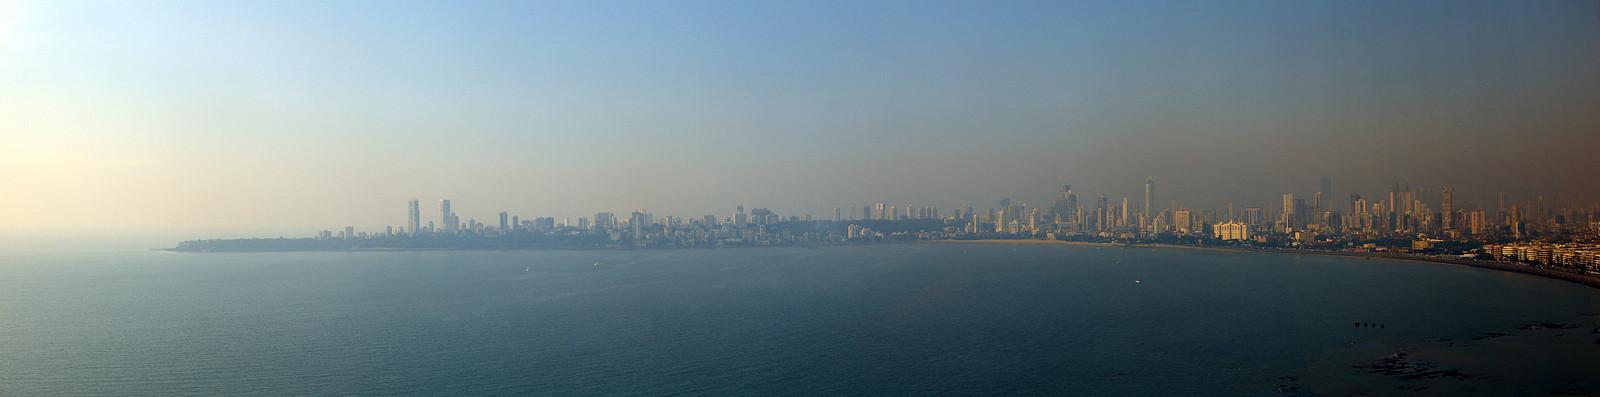 Marine Drive, Mumbai*